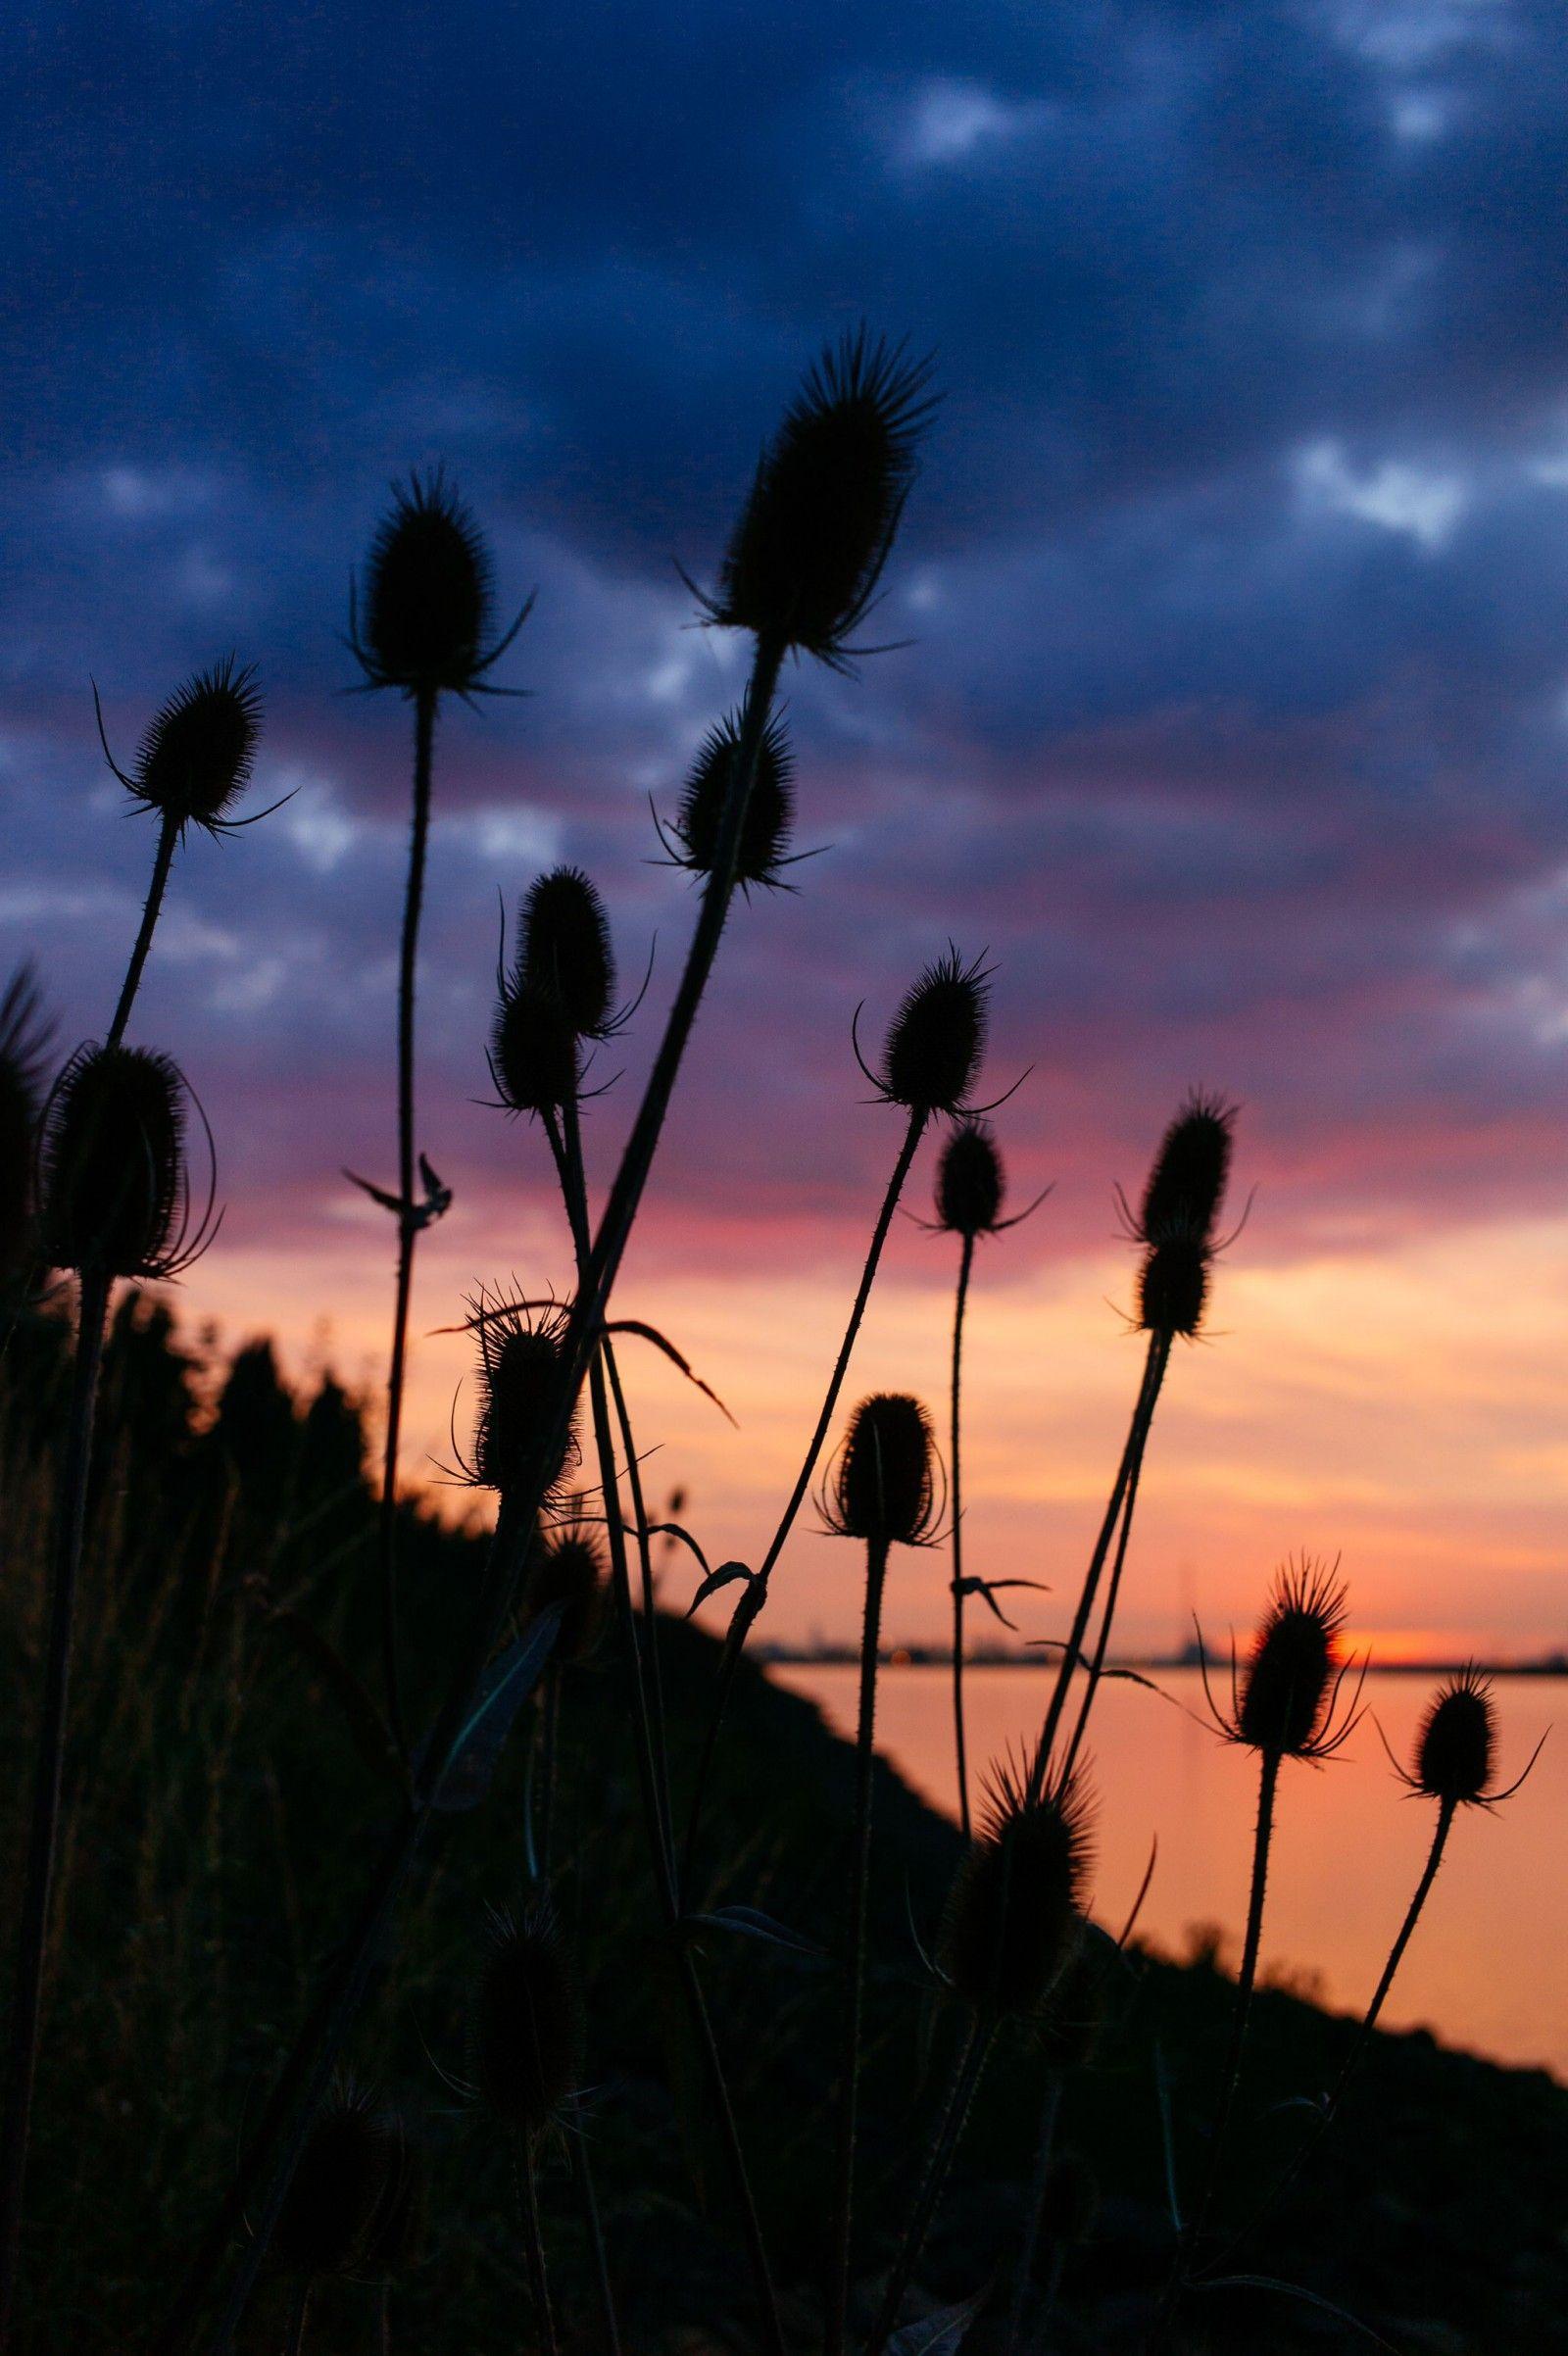 sunset_antwerp_belgium_leica_m9p_summicron_35mm_asph_jipvankuijk